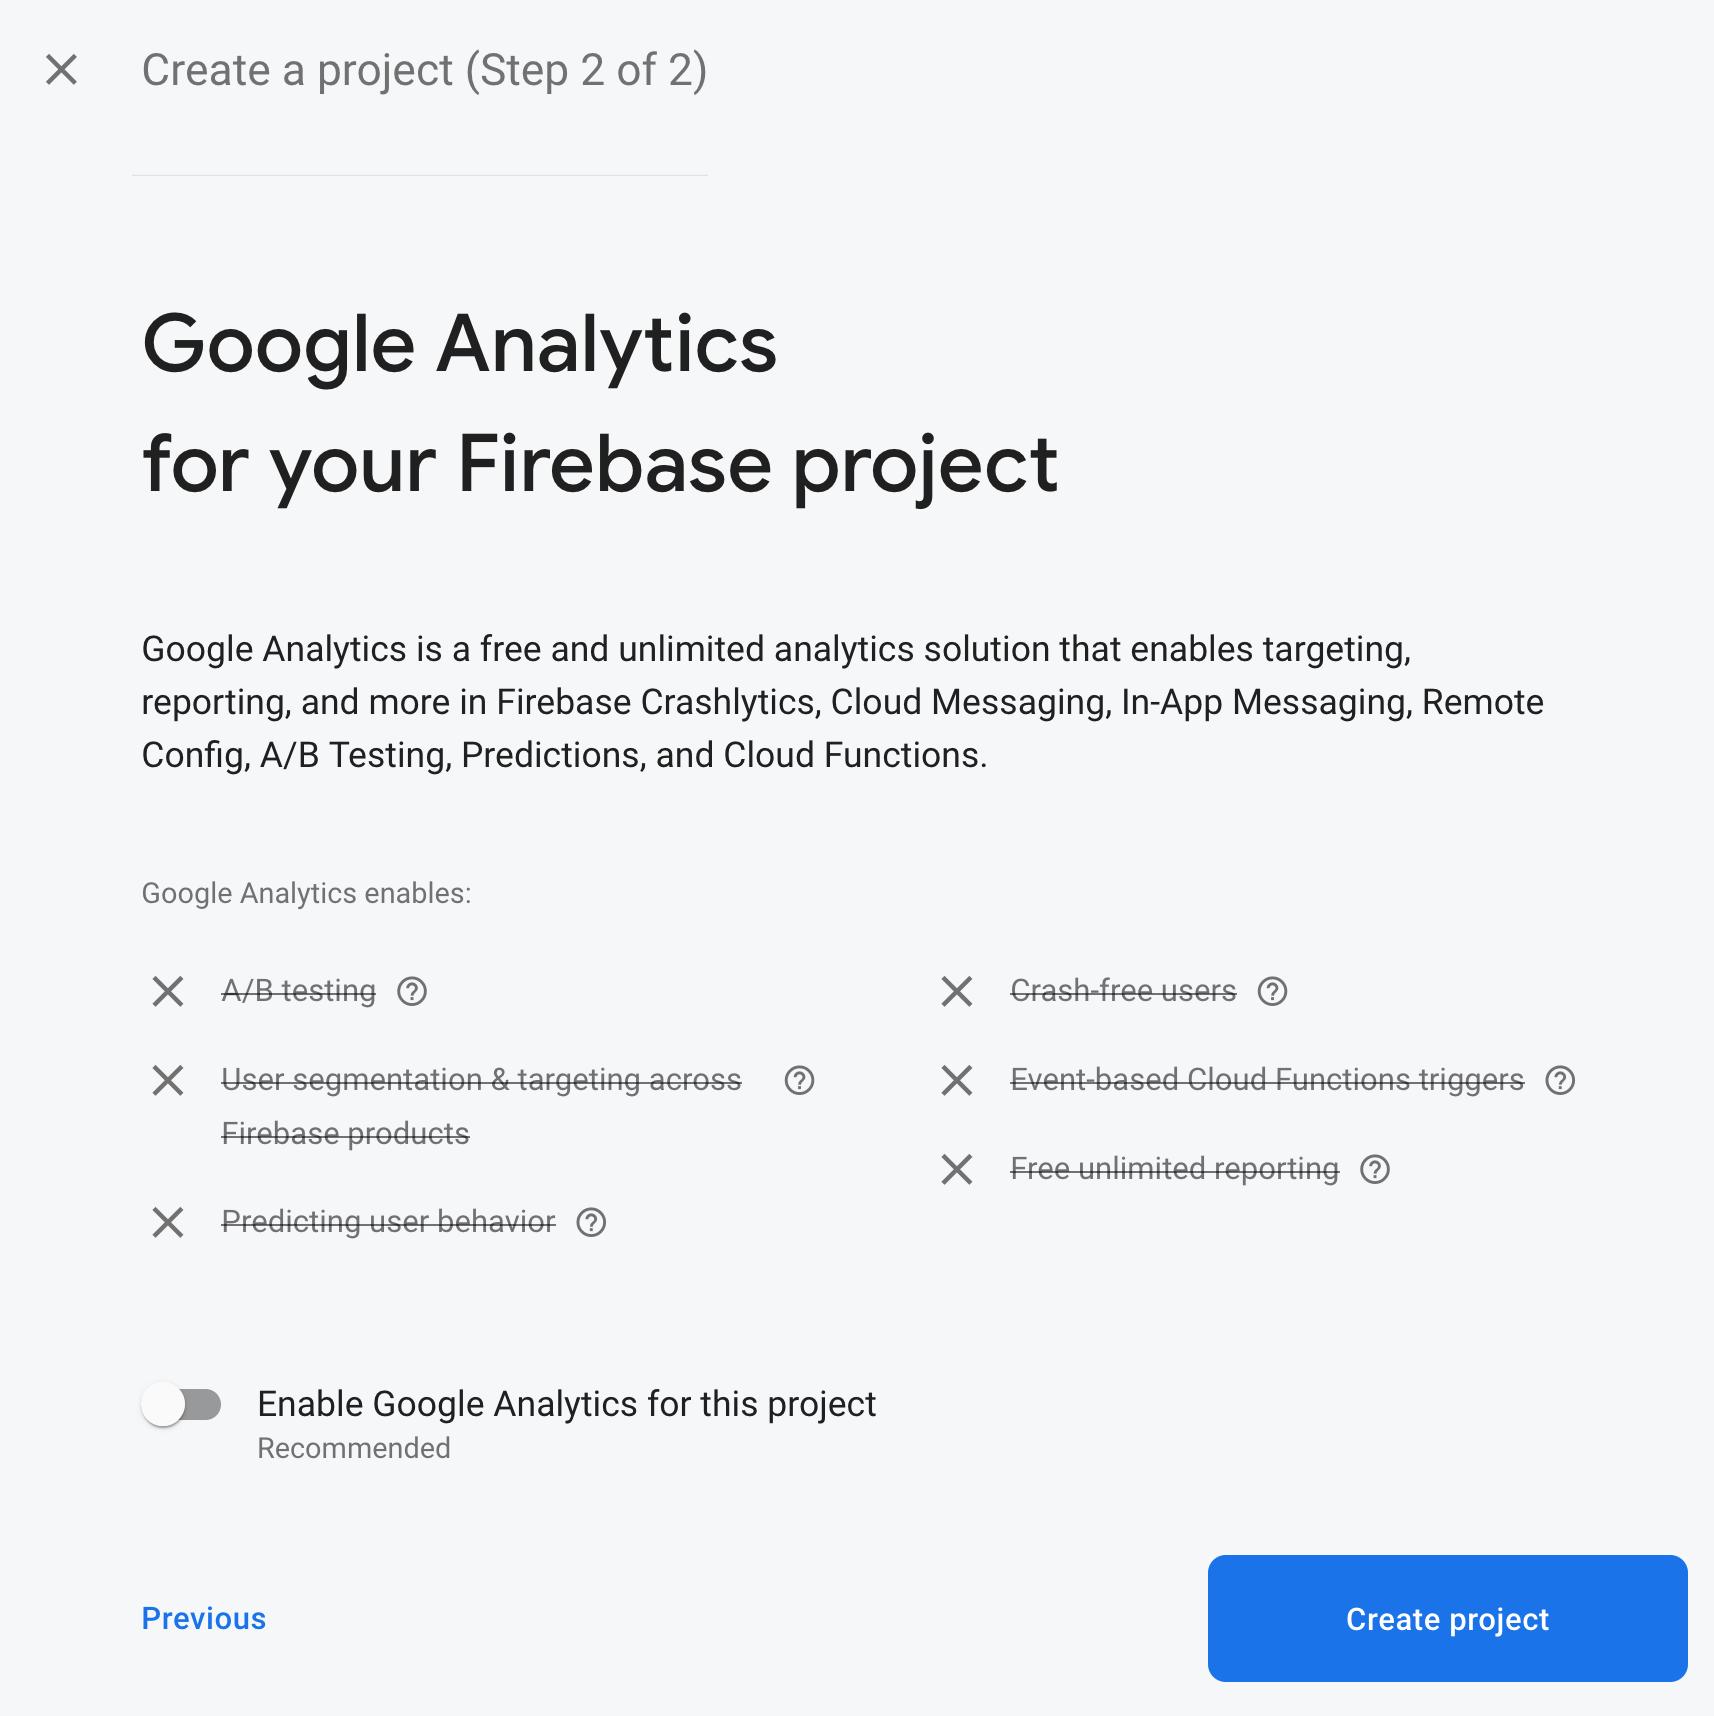 Firebase project disable Google Analytics